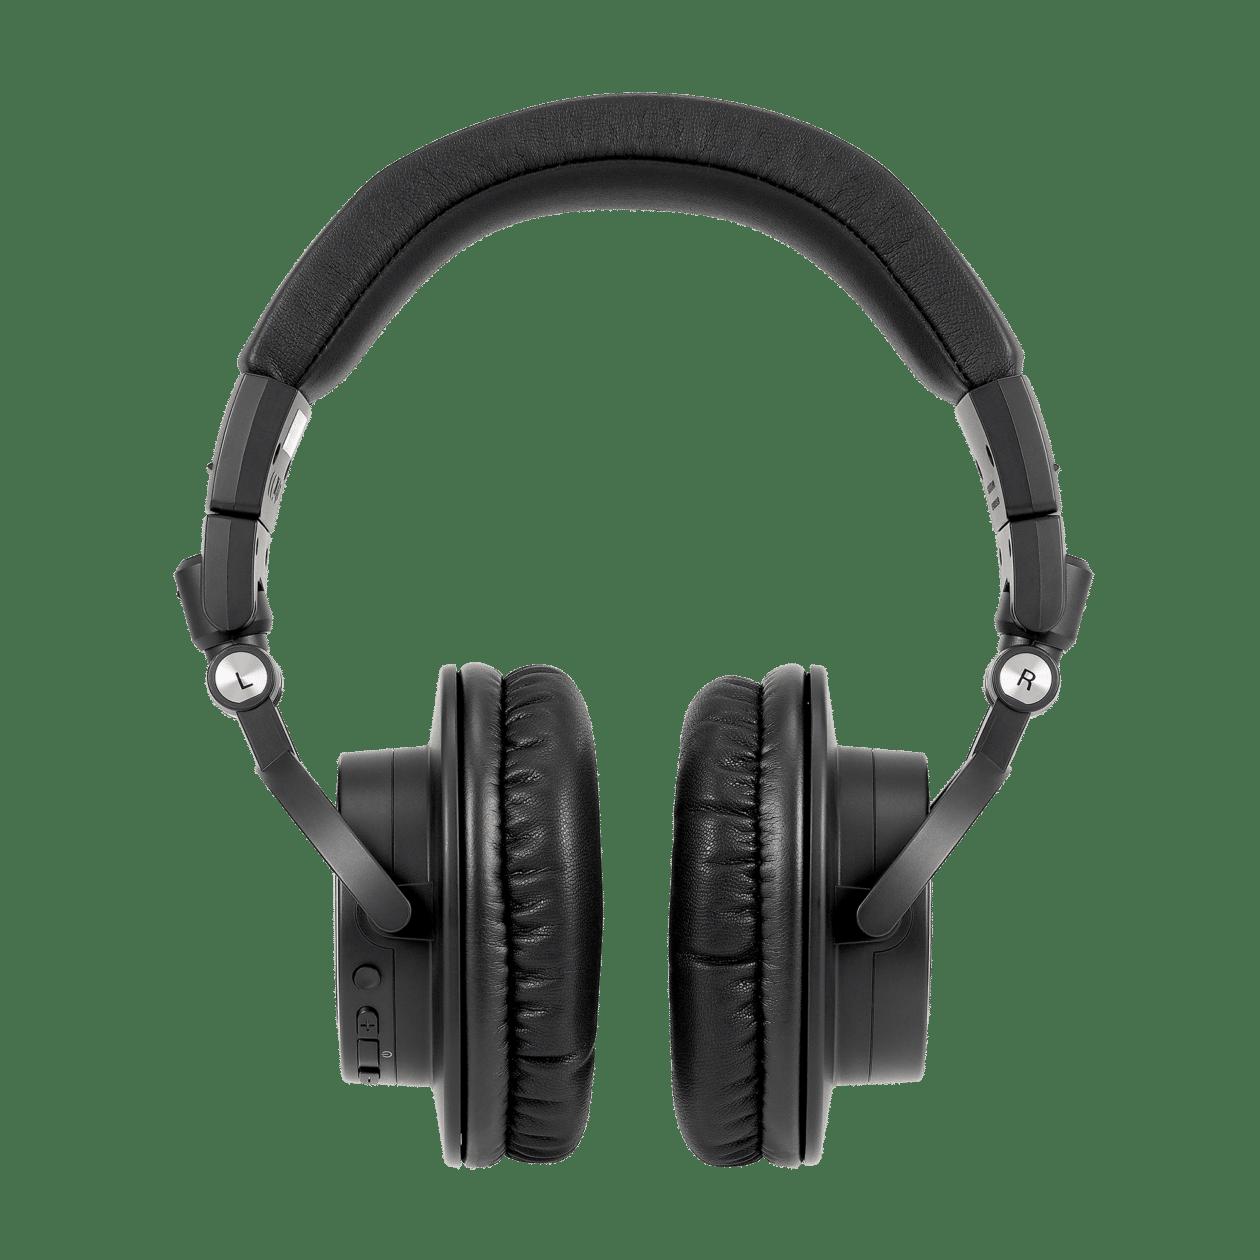 Audio-Technica M50xBT2